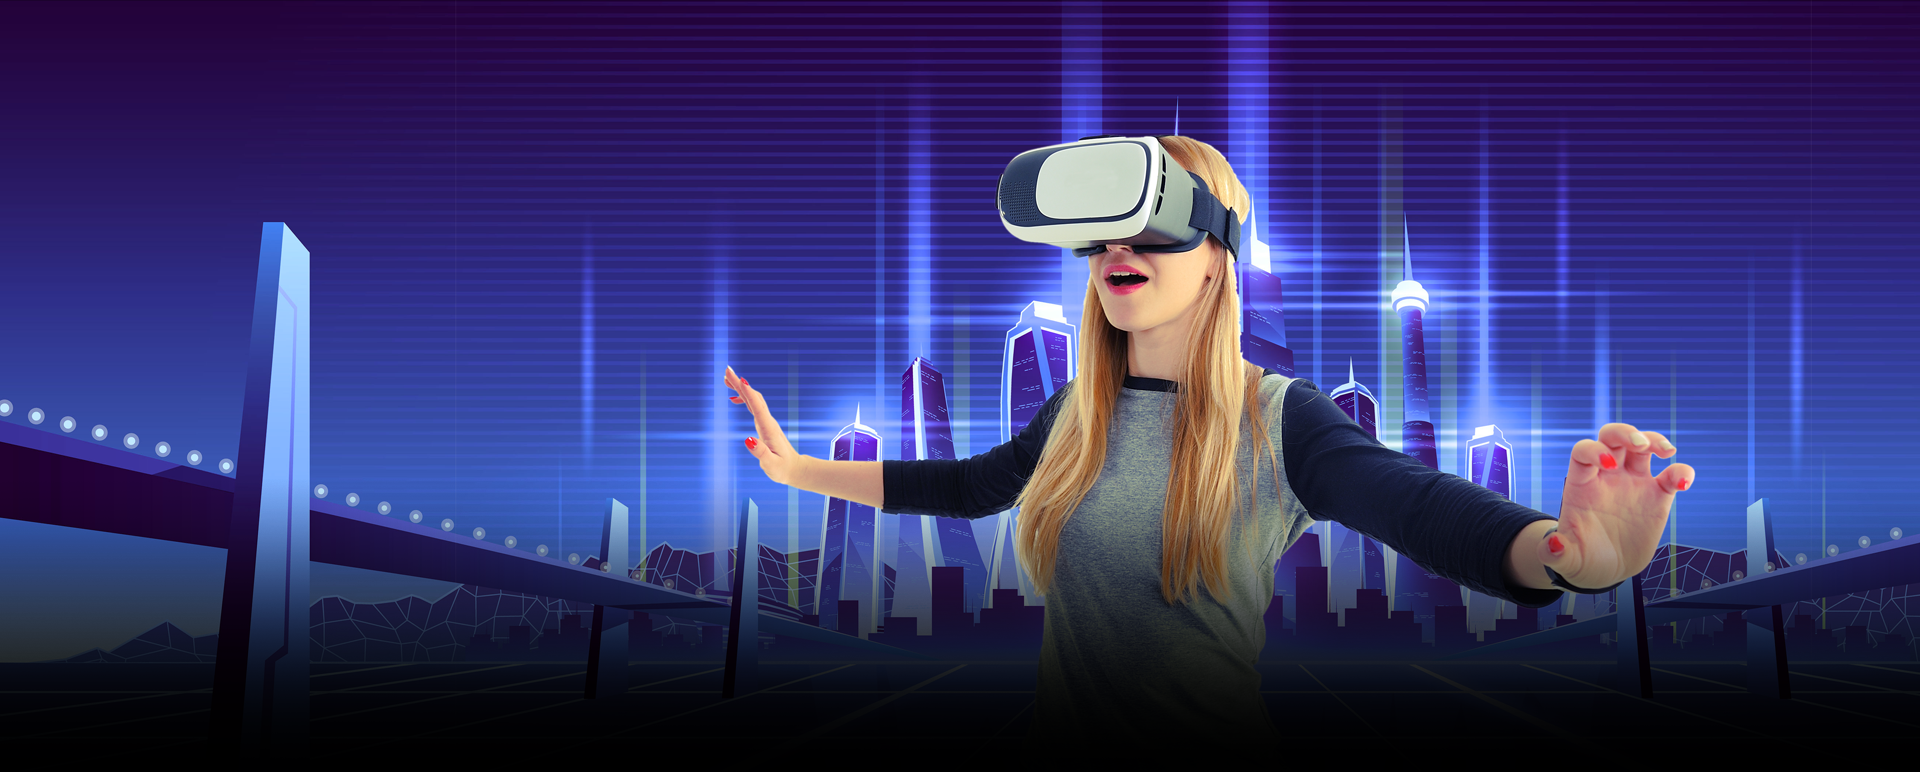 virtual reality VR morgana studios immersive tecnology